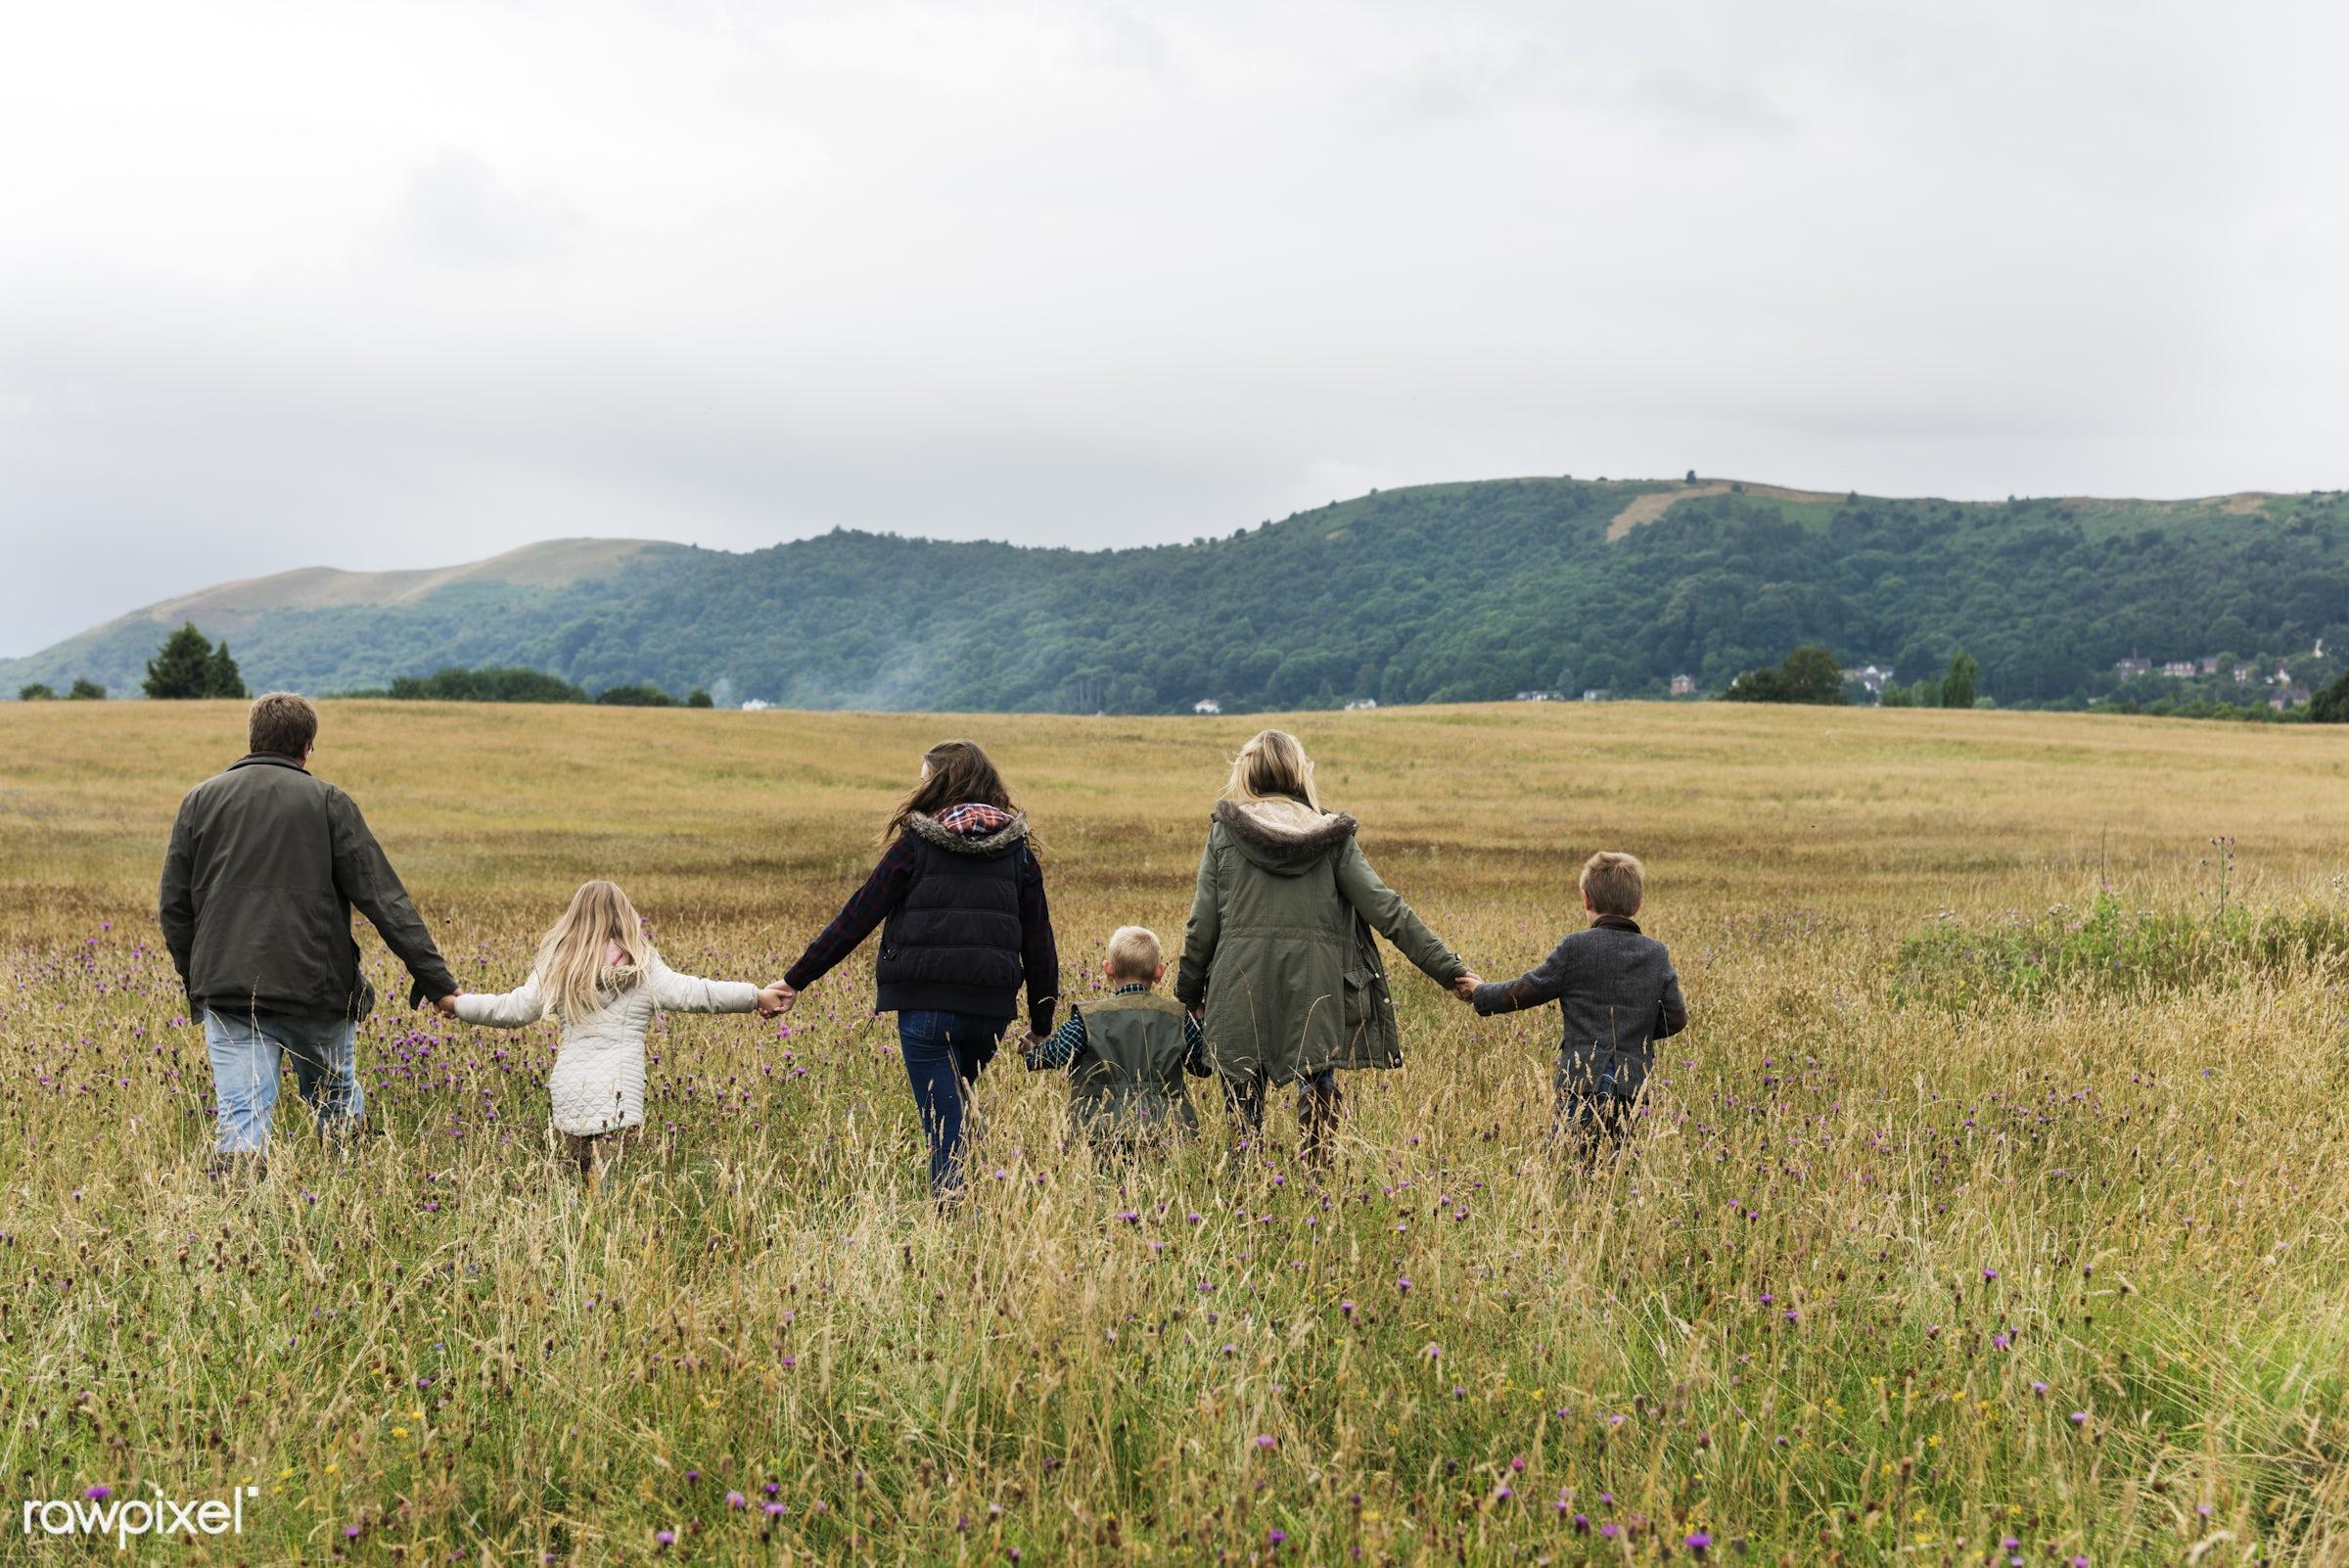 bonding, boy, care, casual, childhood, children, daughter, enjoyment, environment, environmental, family, father, field,...